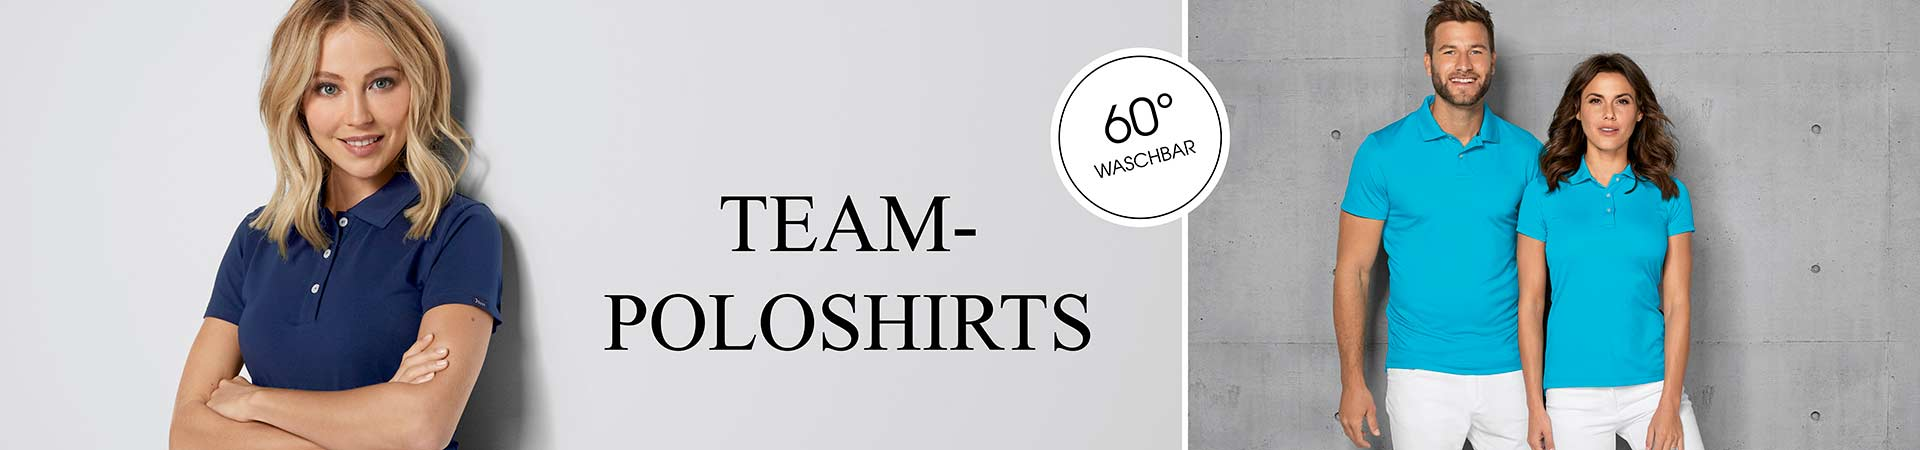 Teampoloshirts